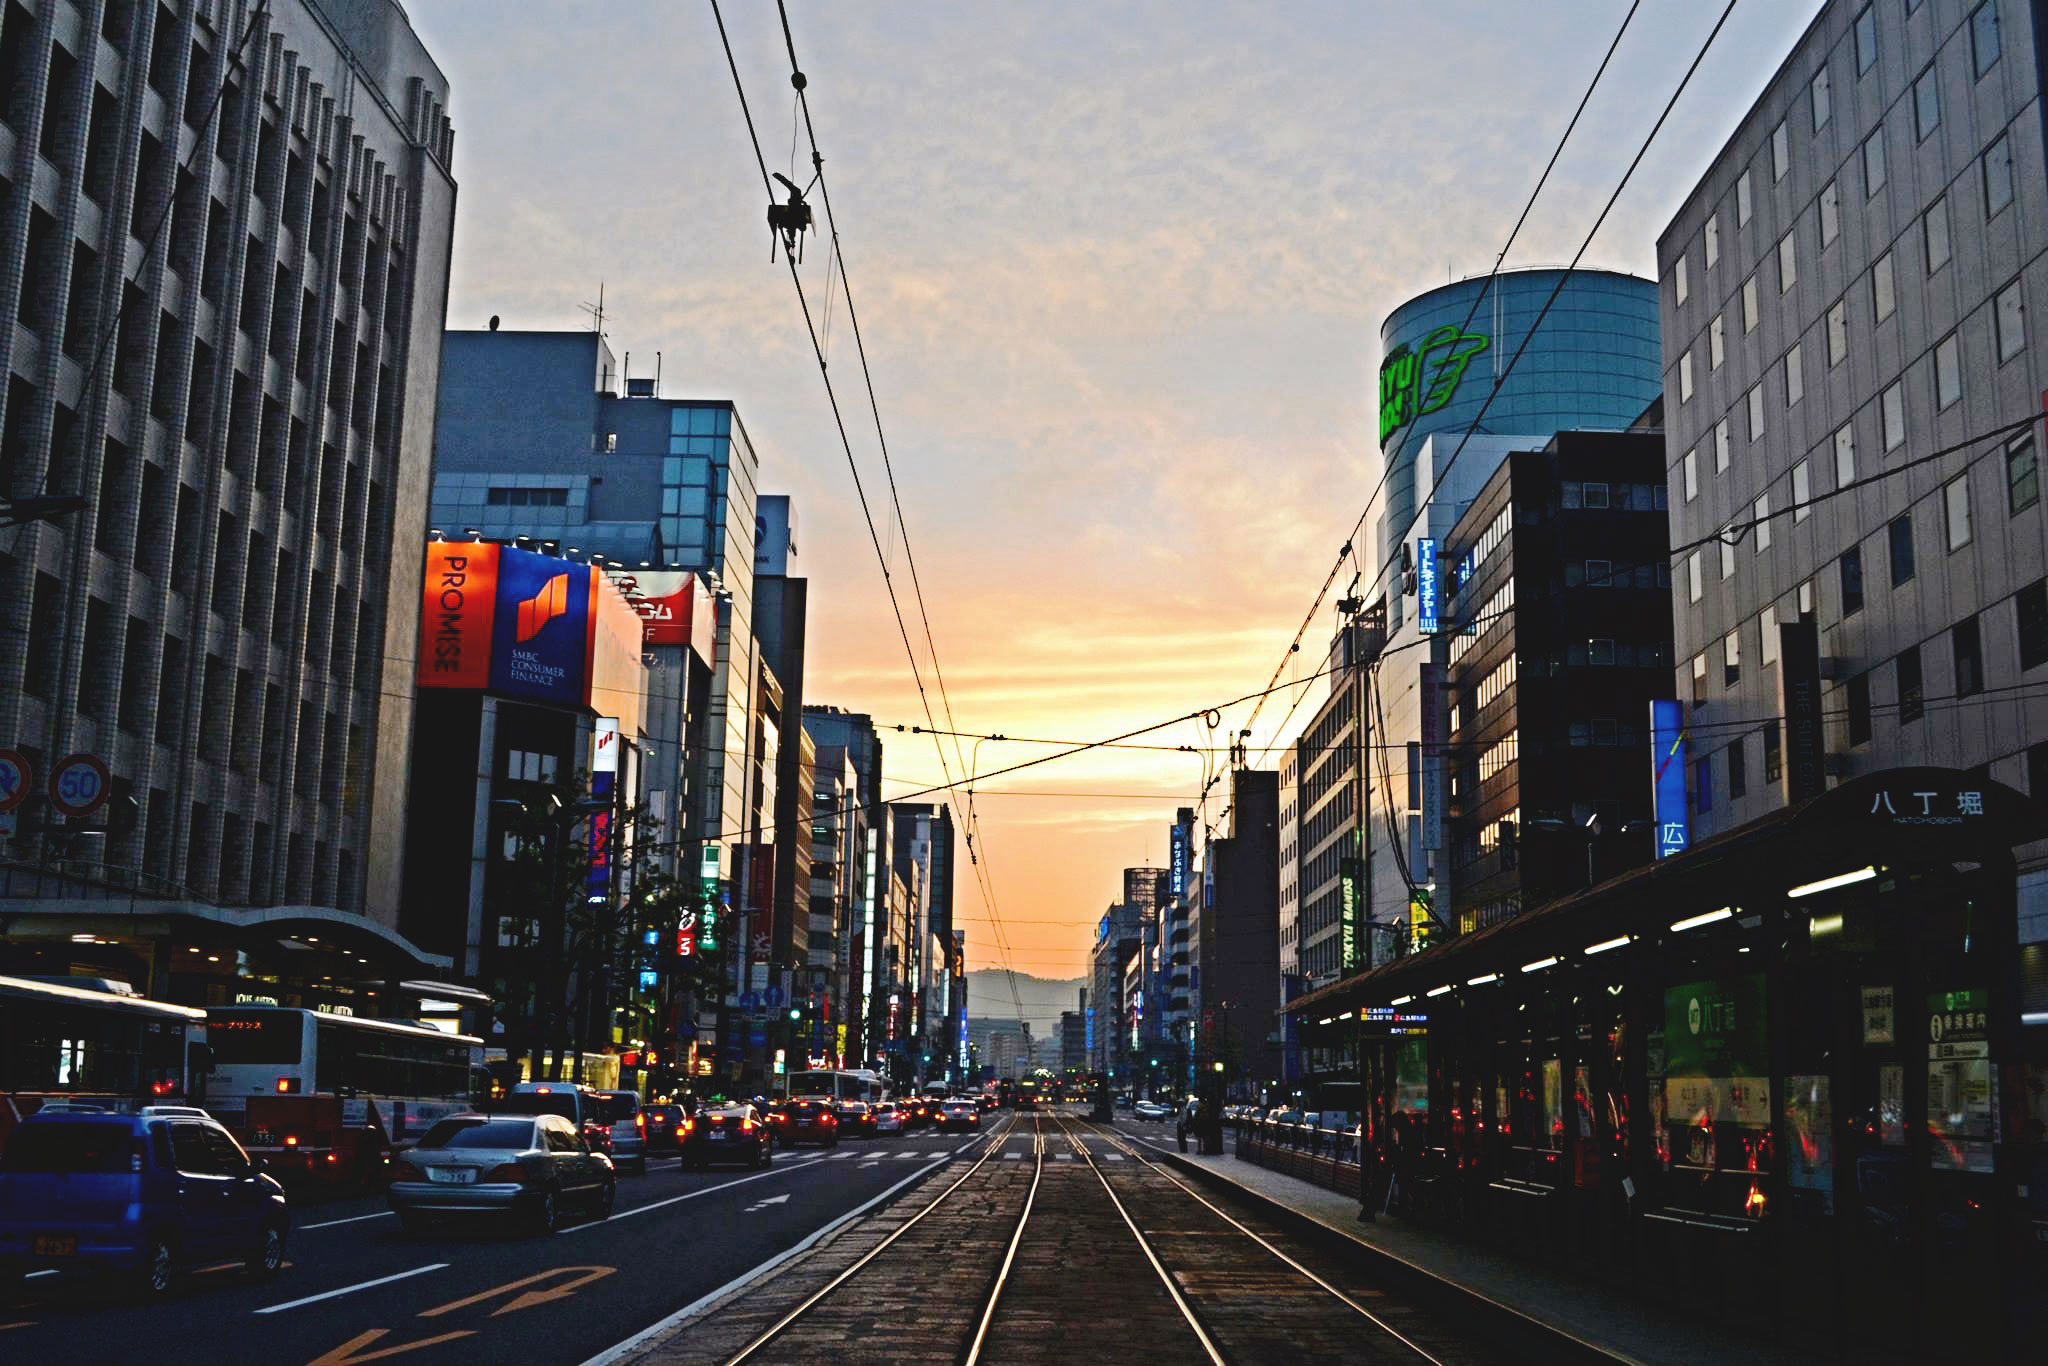 Lightrail tracks at sunset in Hiroshima